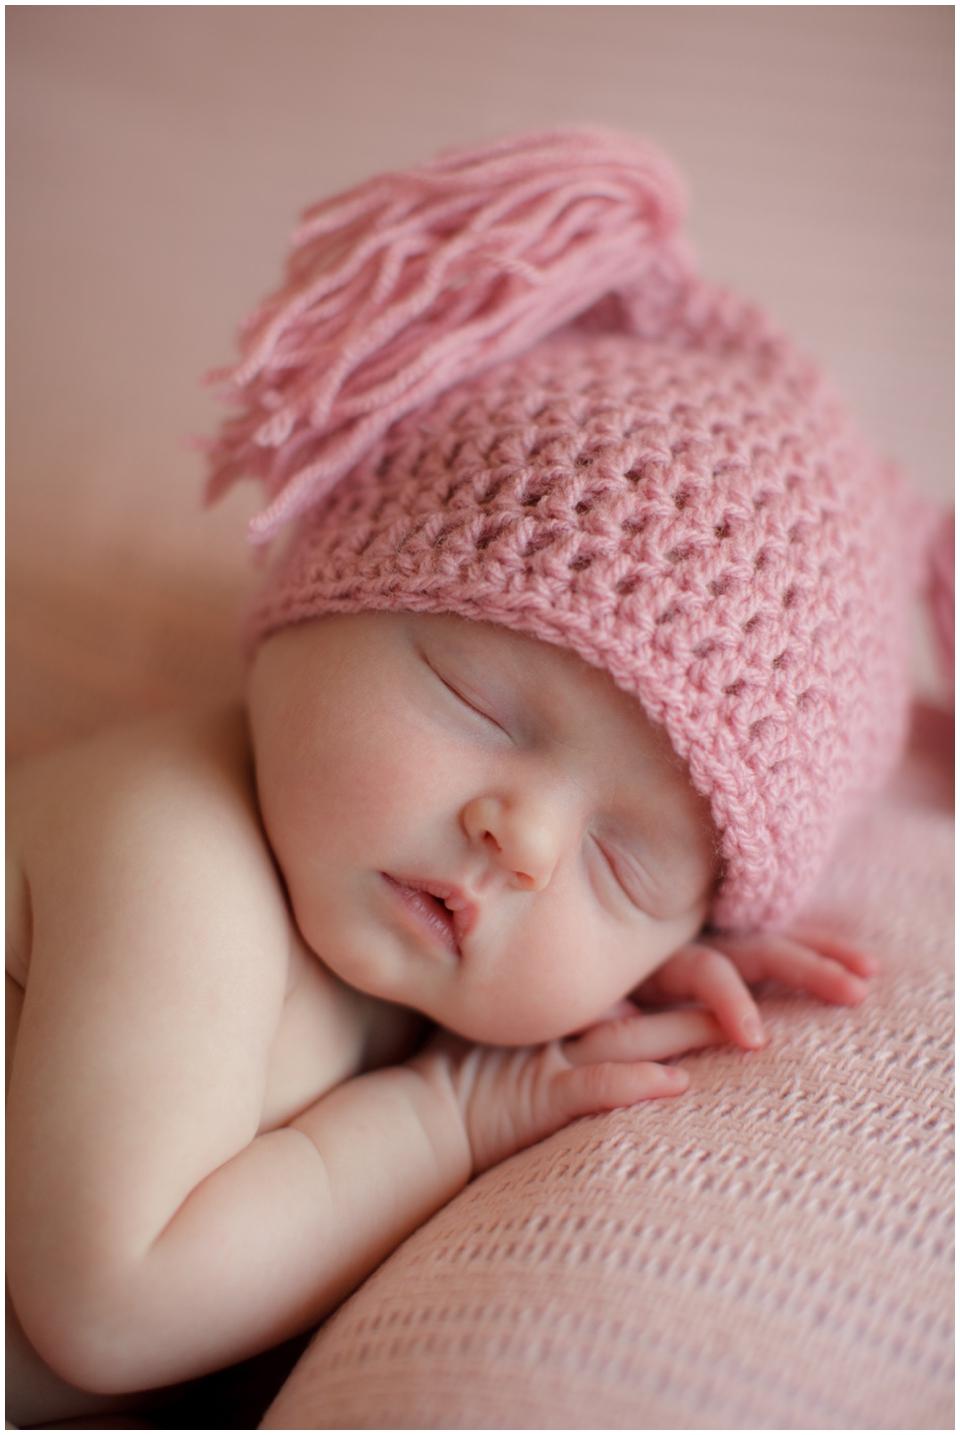 Newborn Baby Photographer in Dorking, Surrey (2)